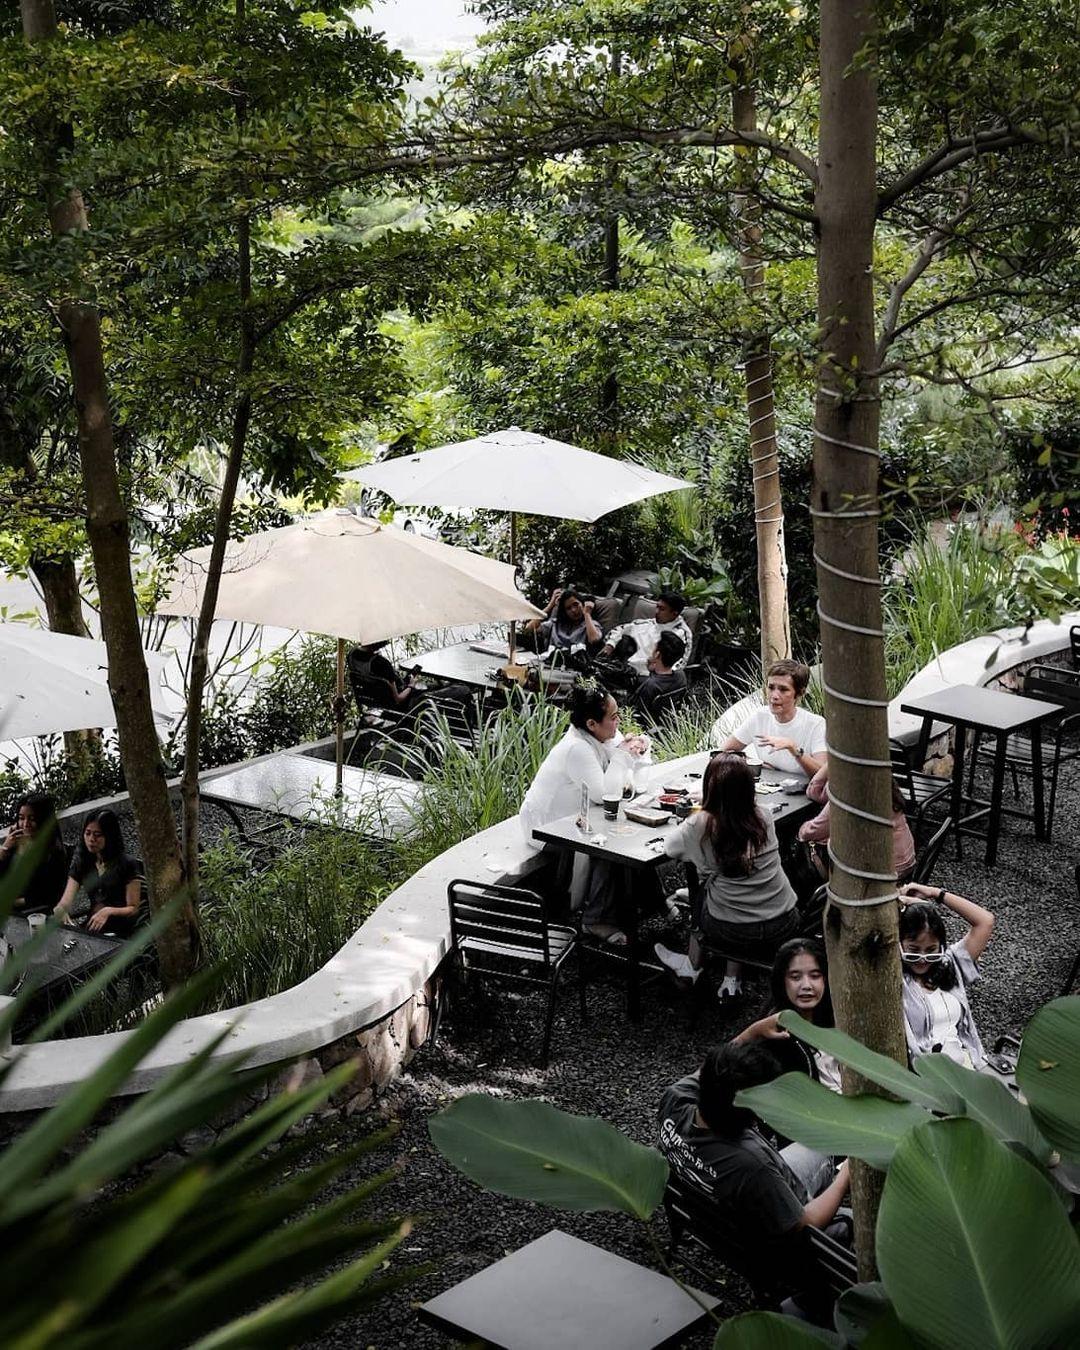 Suasana Pengunjung Di Cafe Kopi Bawah Pohon Image From @aa_fotokopi